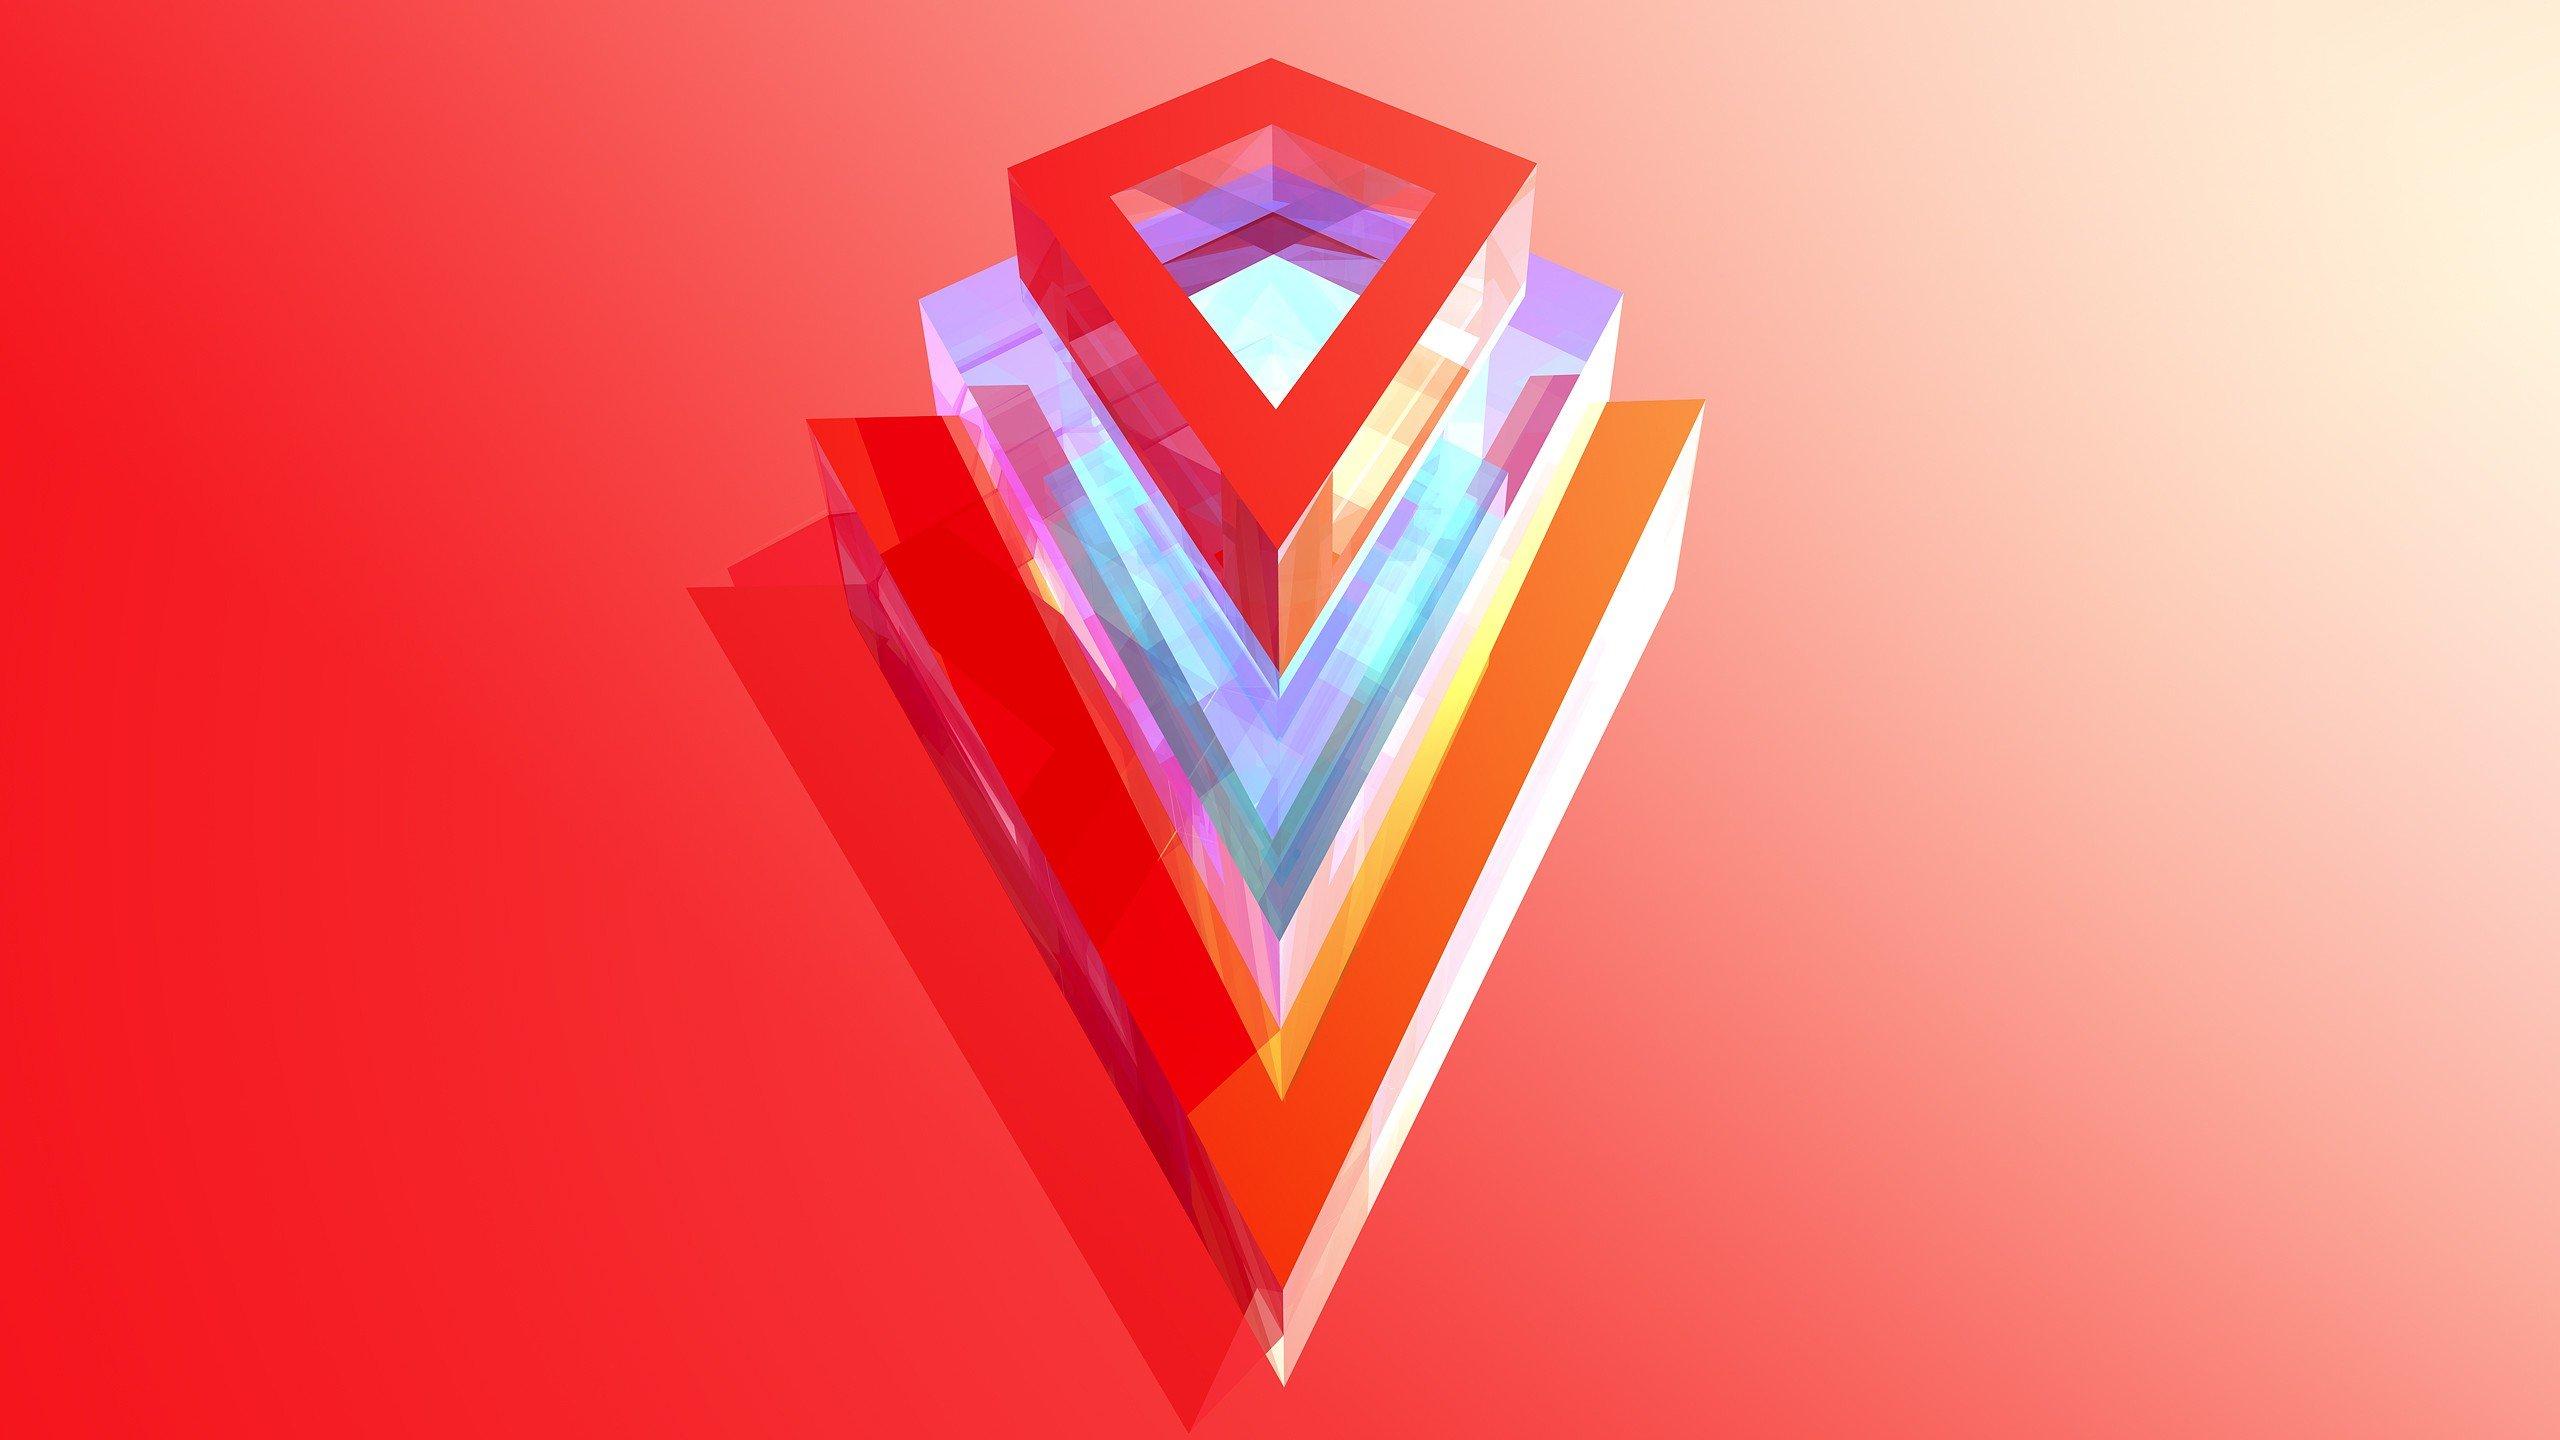 Abstract vectors digital art Justin Maller wallpaper | 2560x1440 | 258735 | WallpaperUP